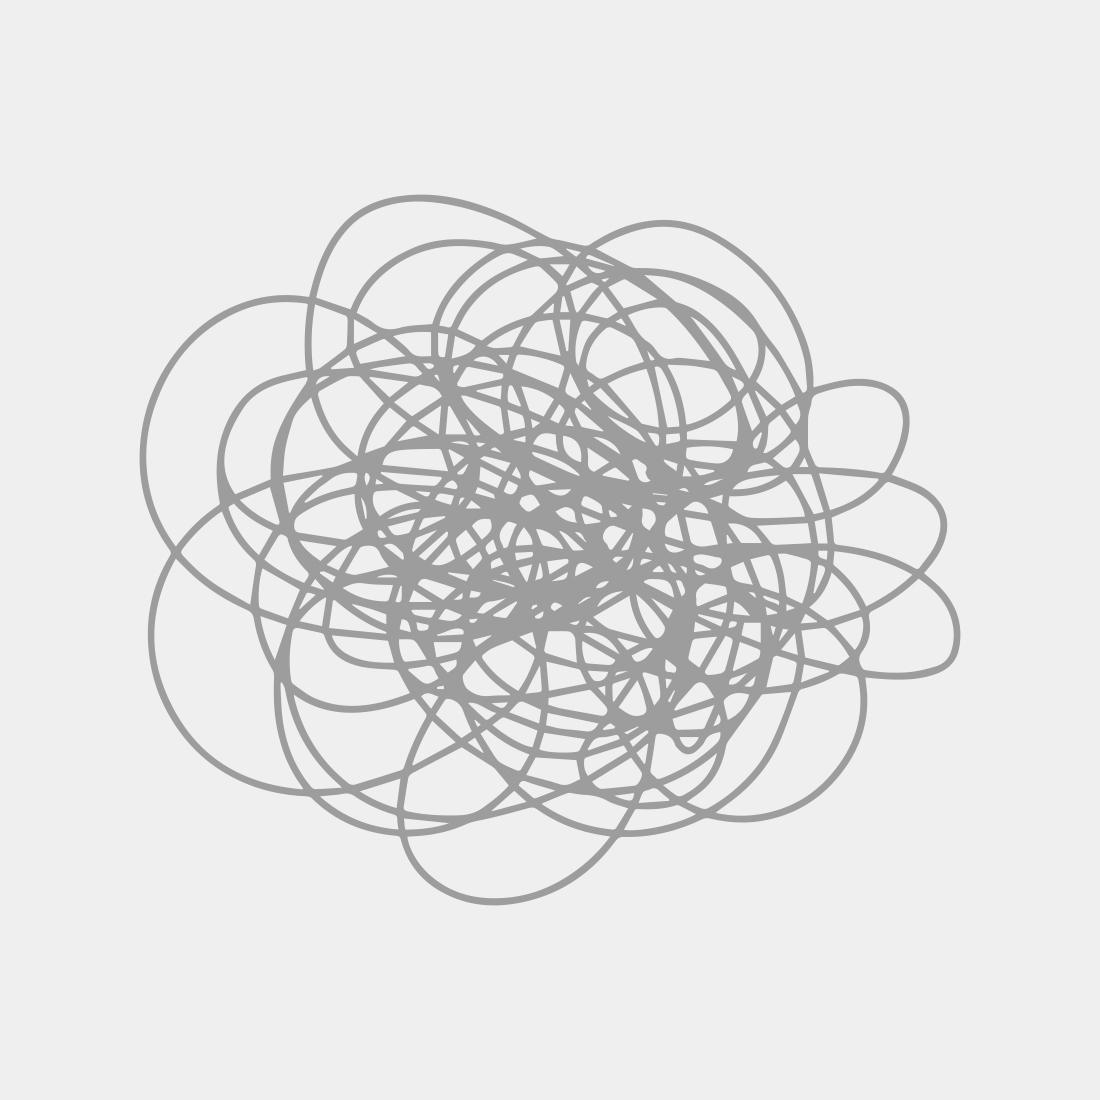 Albert Irvin OBE RA Untitled opus w.29